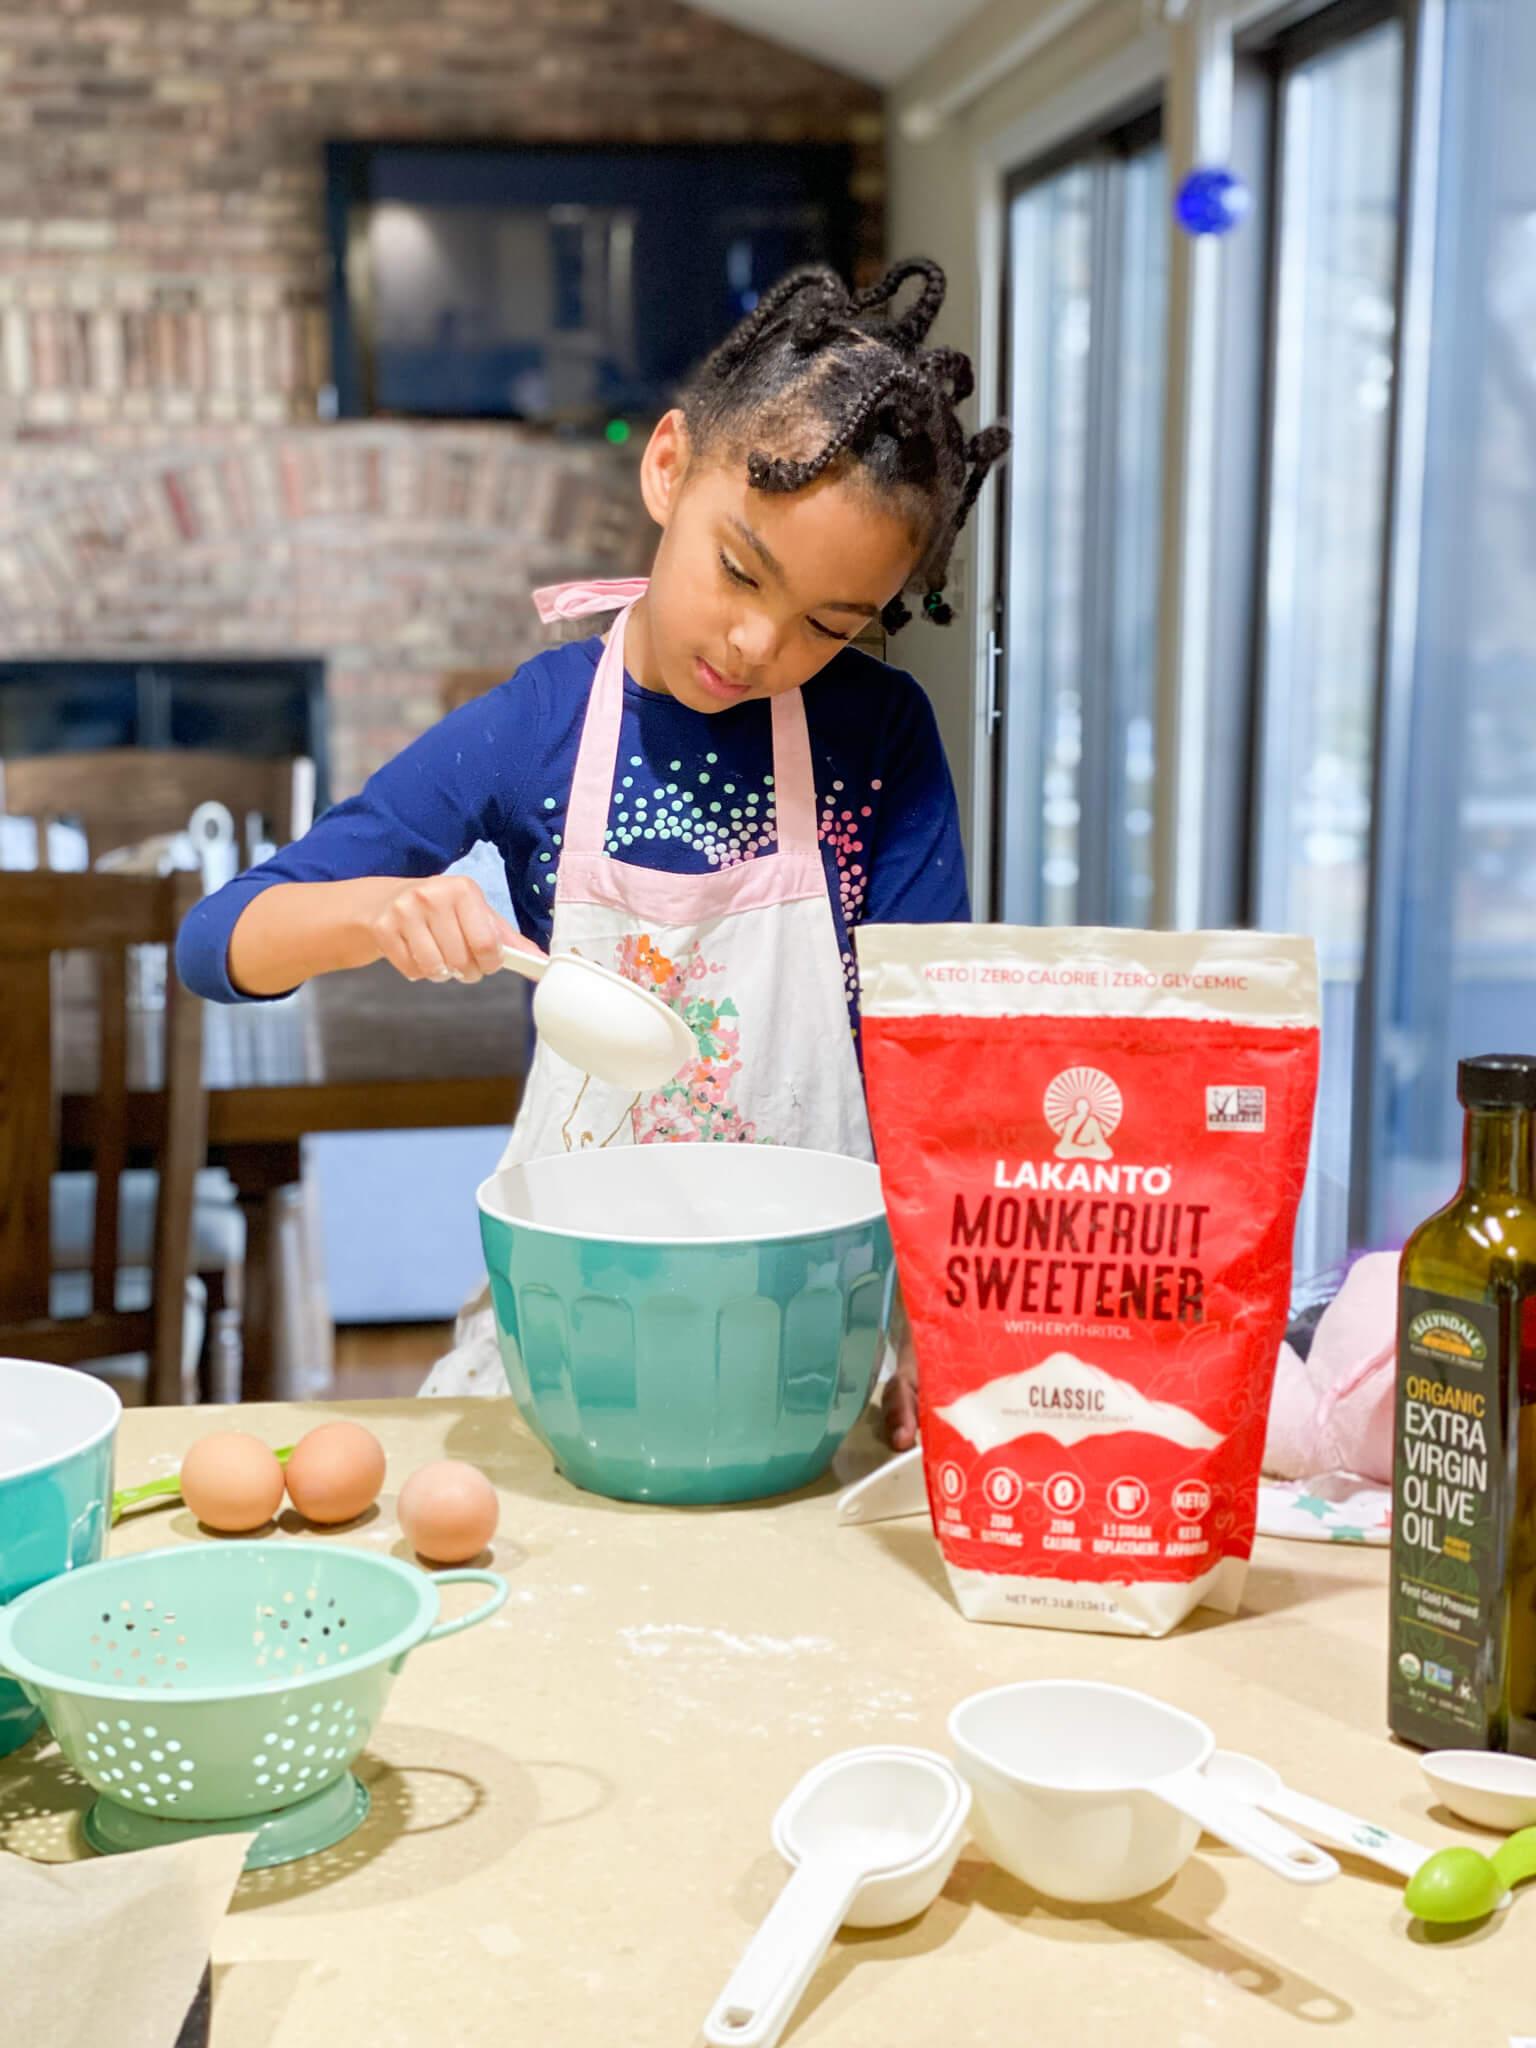 Gluten and Dairy-Free Almond Poppy Seed Sheet Cake Recipe agutsygirl.com #glutenfreerecipe #dairyfreerecipe #glutenfreedairyfree #poppyseed Lakanto Monk Fruit